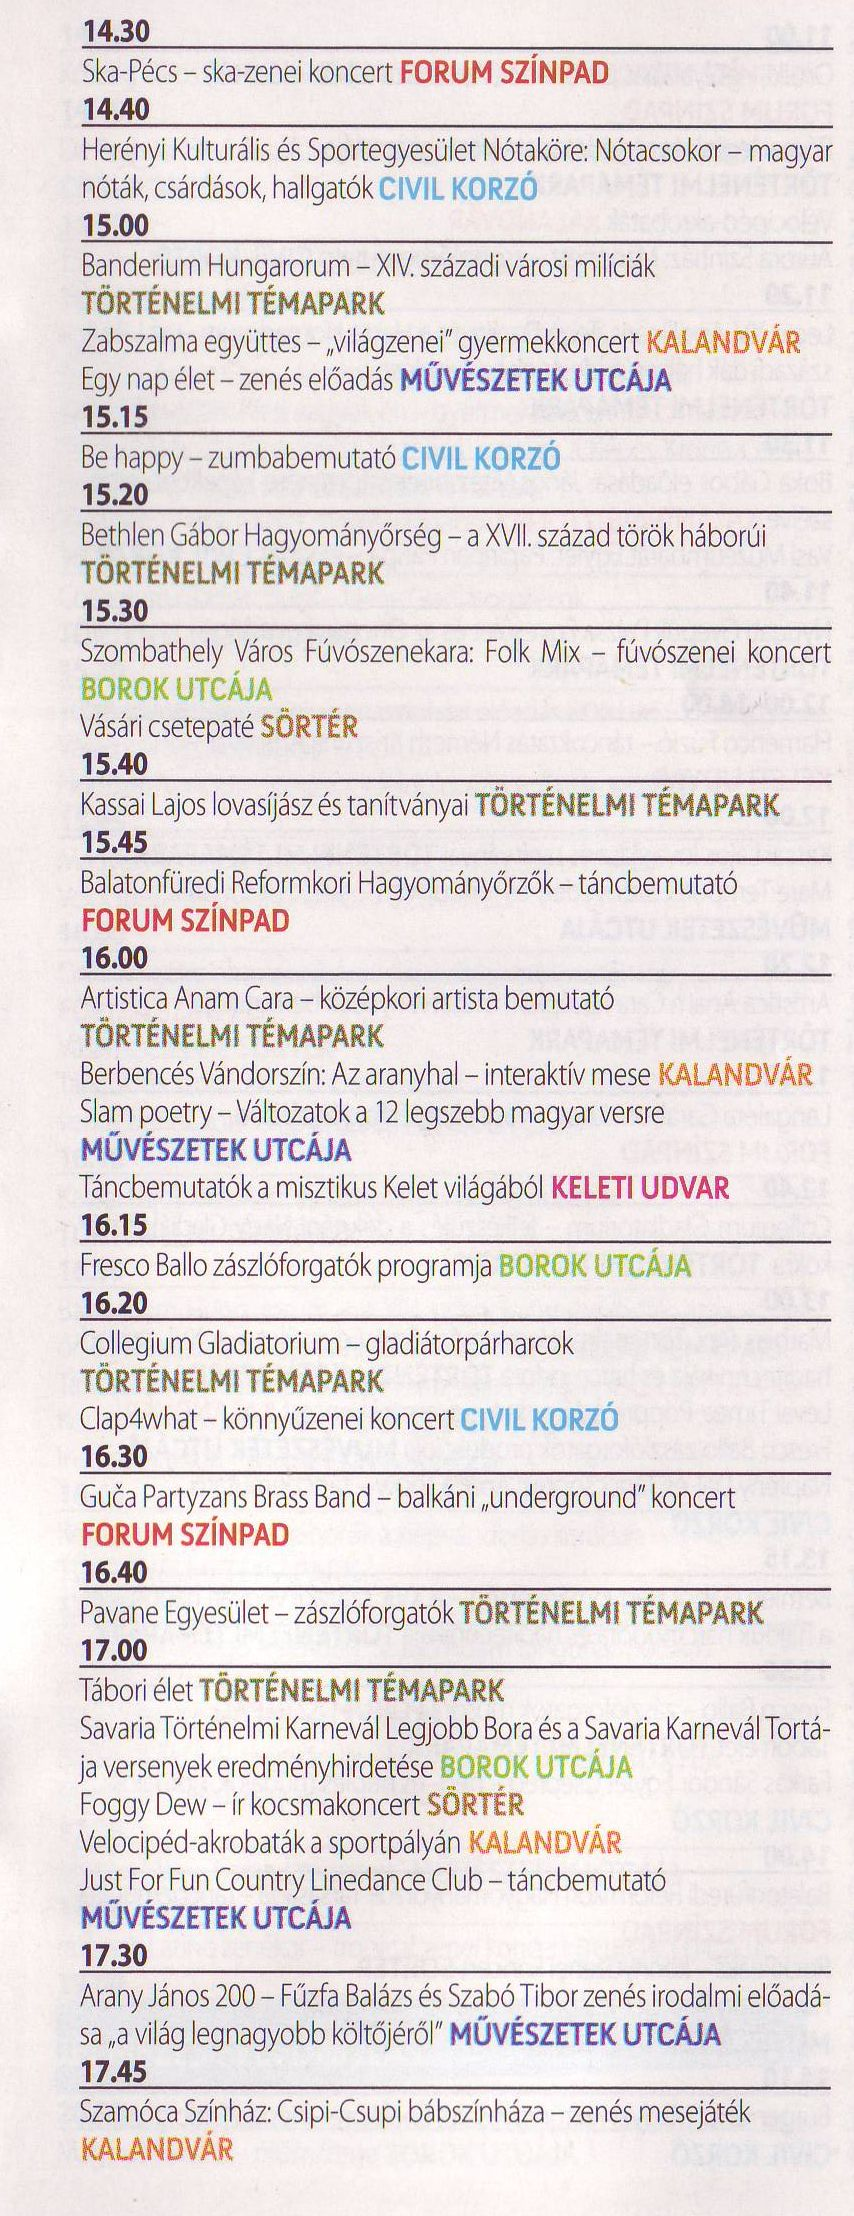 Savaria karnevál program (2017)